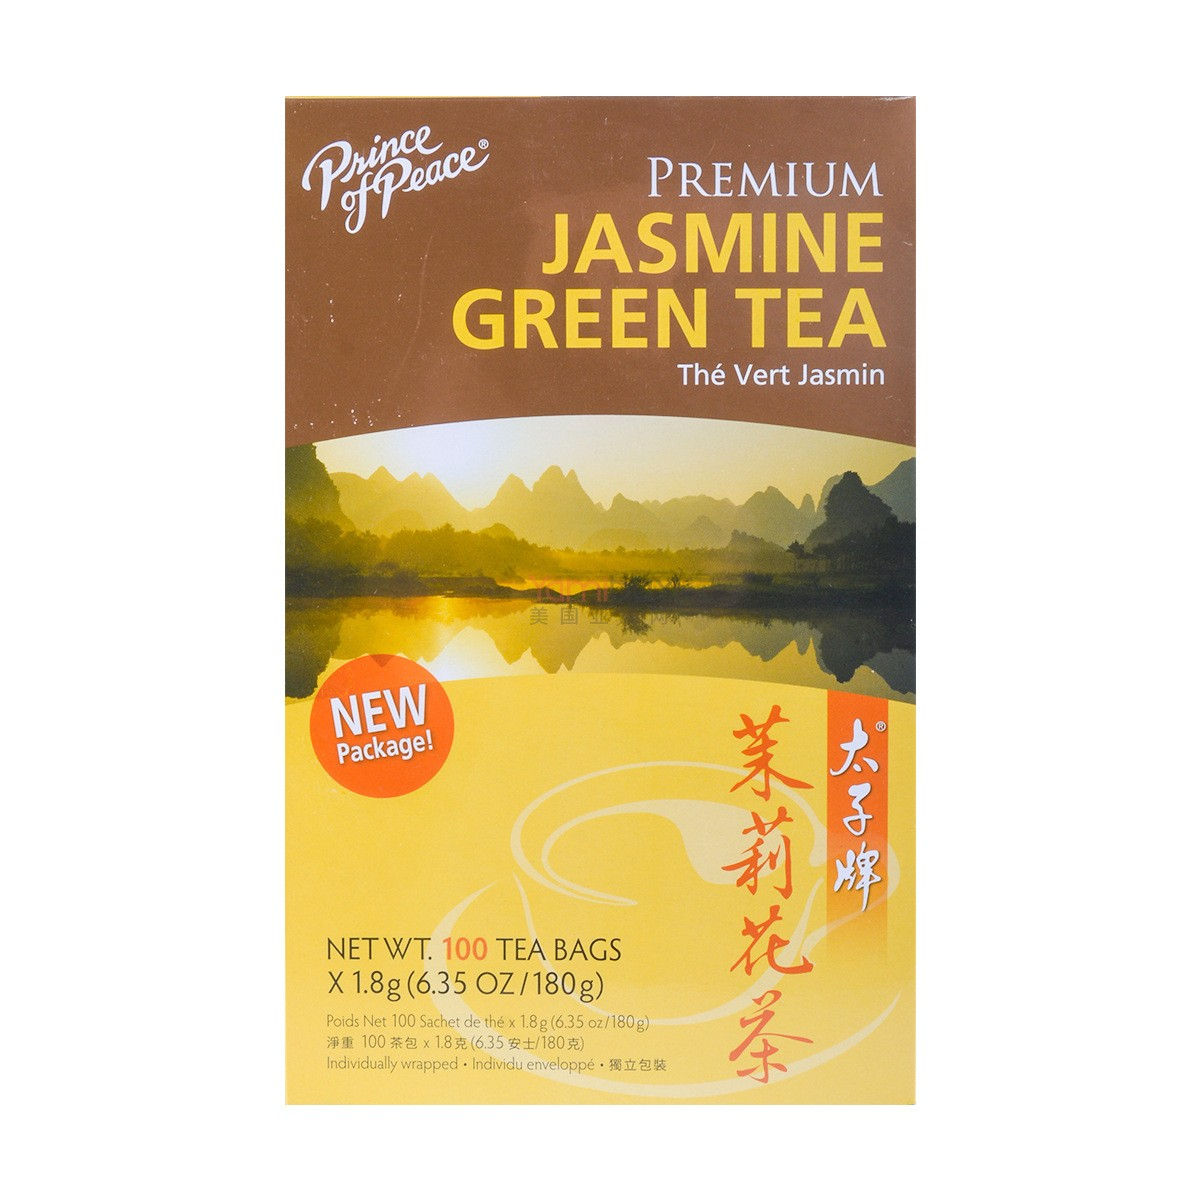 PRINCE OF PEACE Premium Jasmine Green Tea 100 Bags 180g